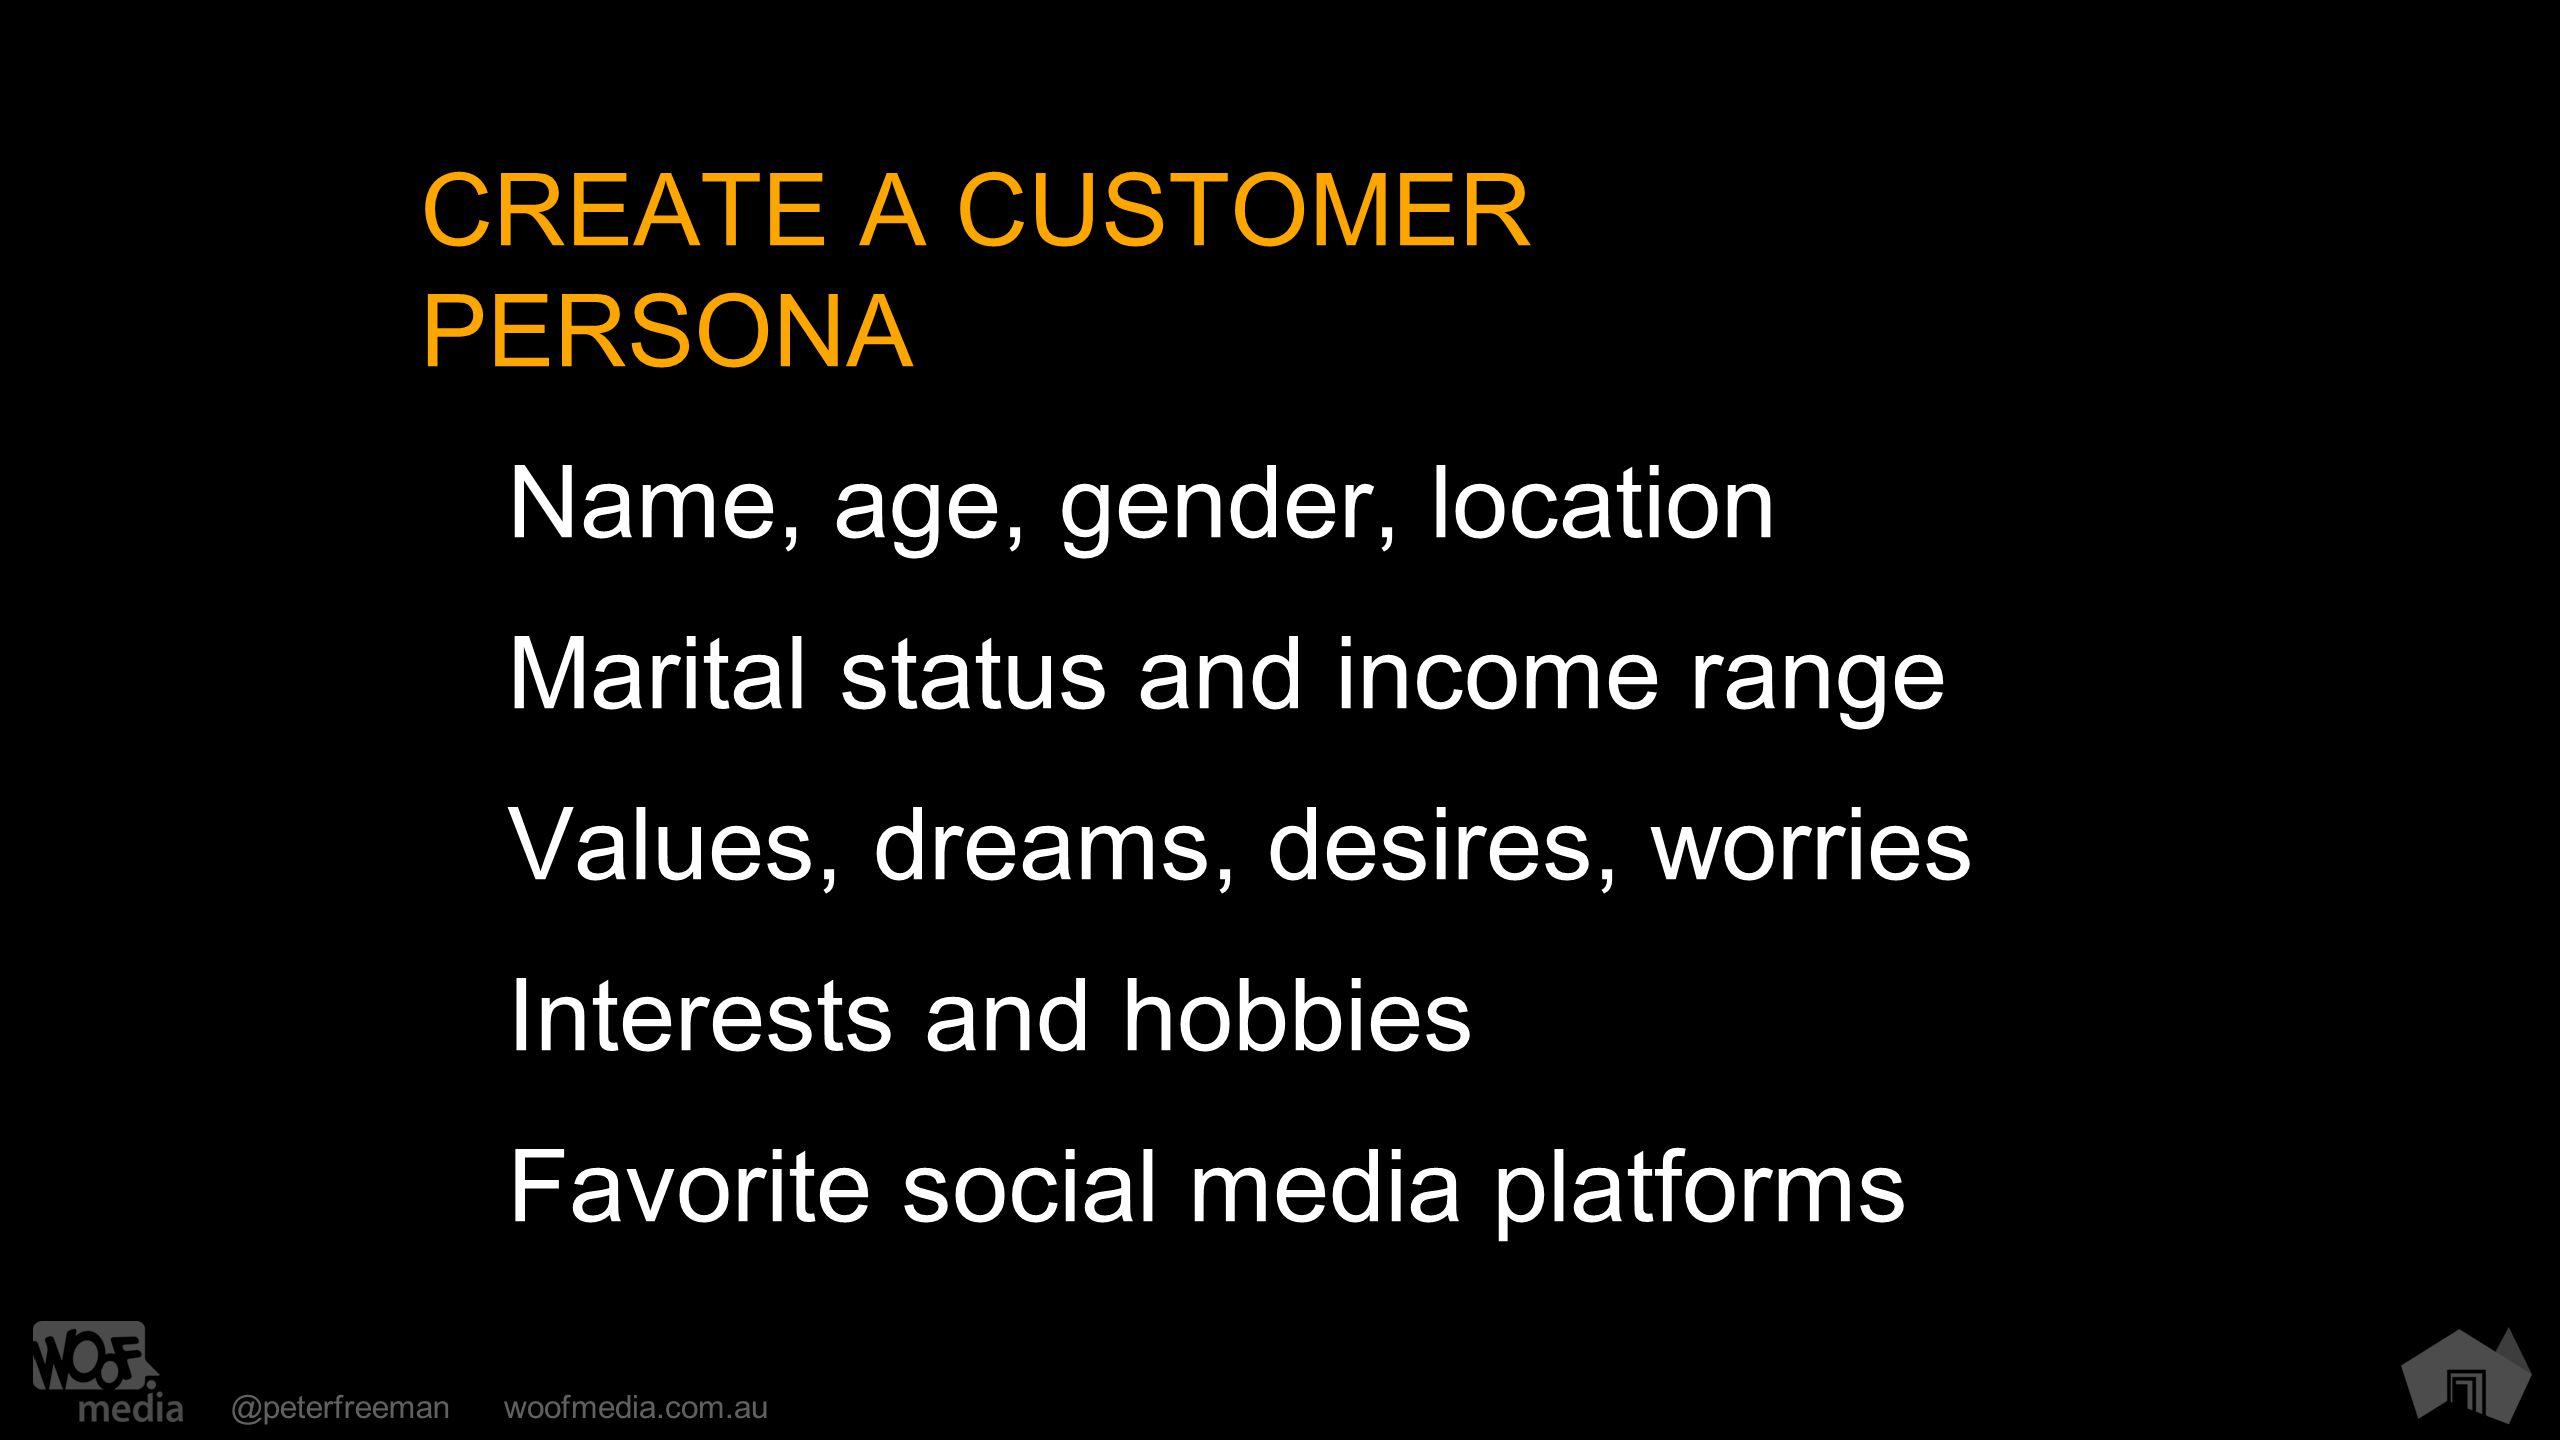 @peterfreemanwoofmedia.com.au CREATE A CUSTOMER PERSONA Name, age, gender, location Marital status and income range Values, dreams, desires, worries Interests and hobbies Favorite social media platforms